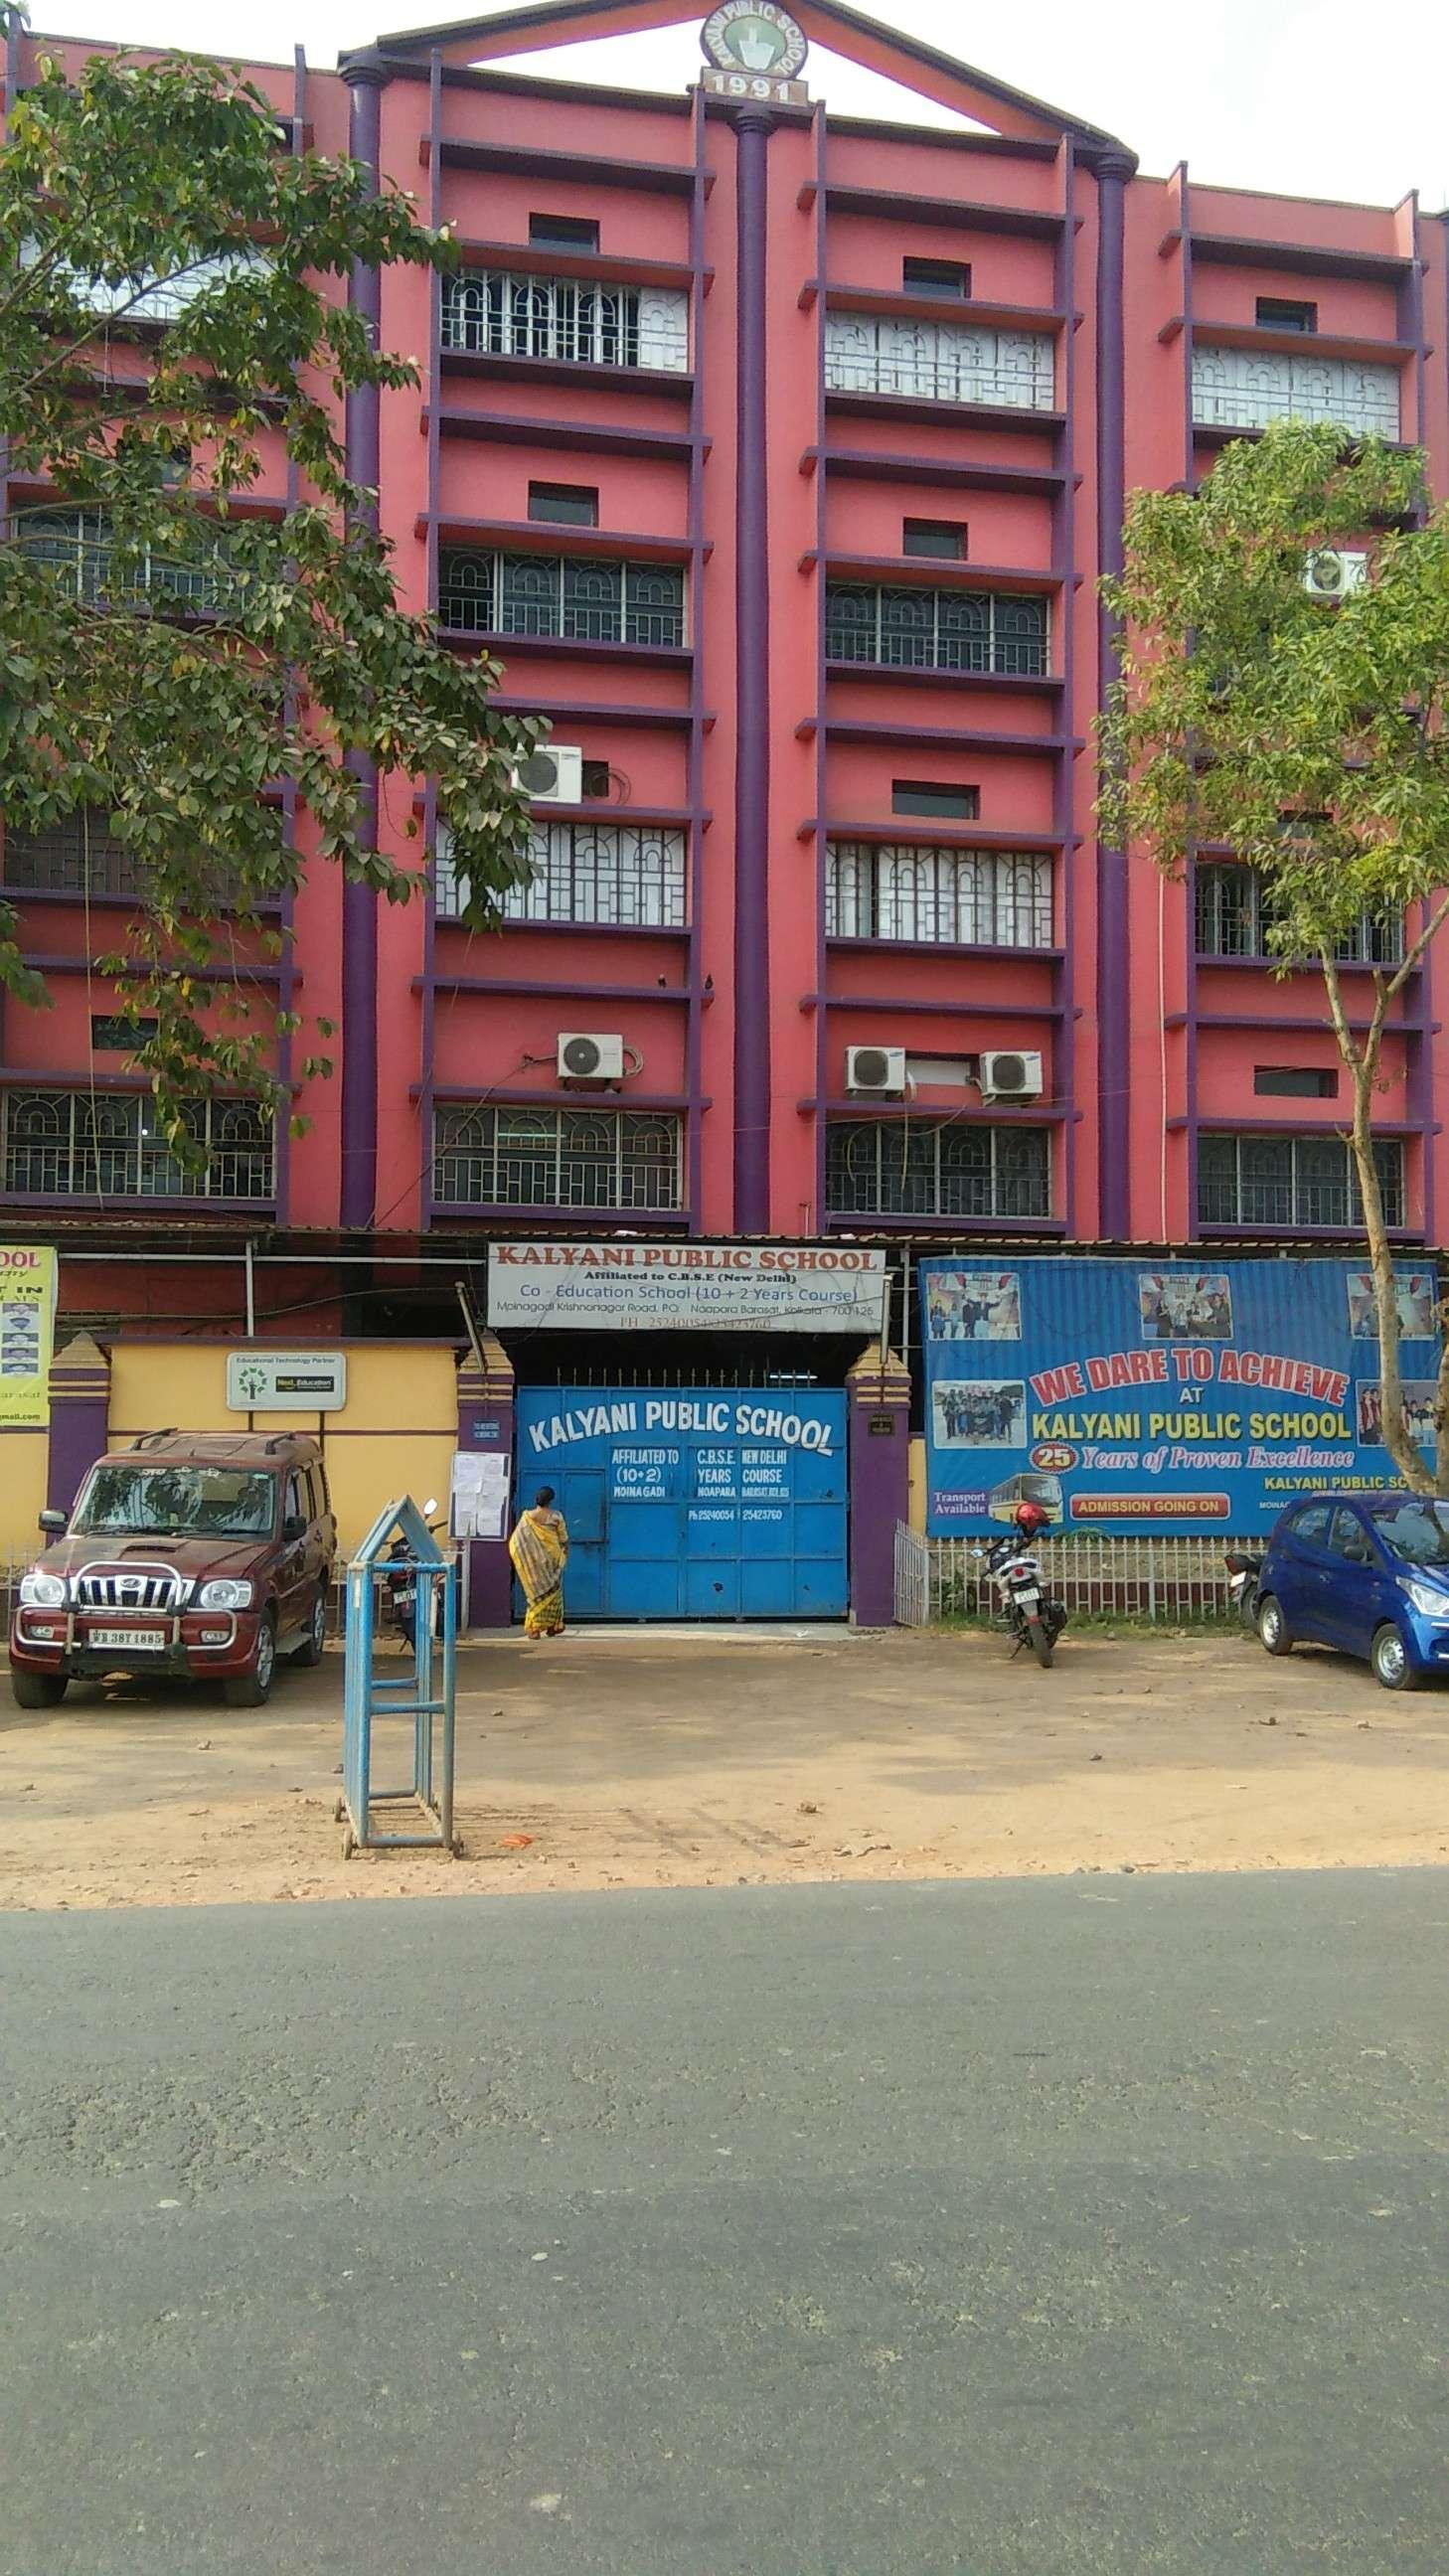 KALYANI PUBLIC SCHOOL MOINAGADI, NOAPARA BARASAT KOLKATTA